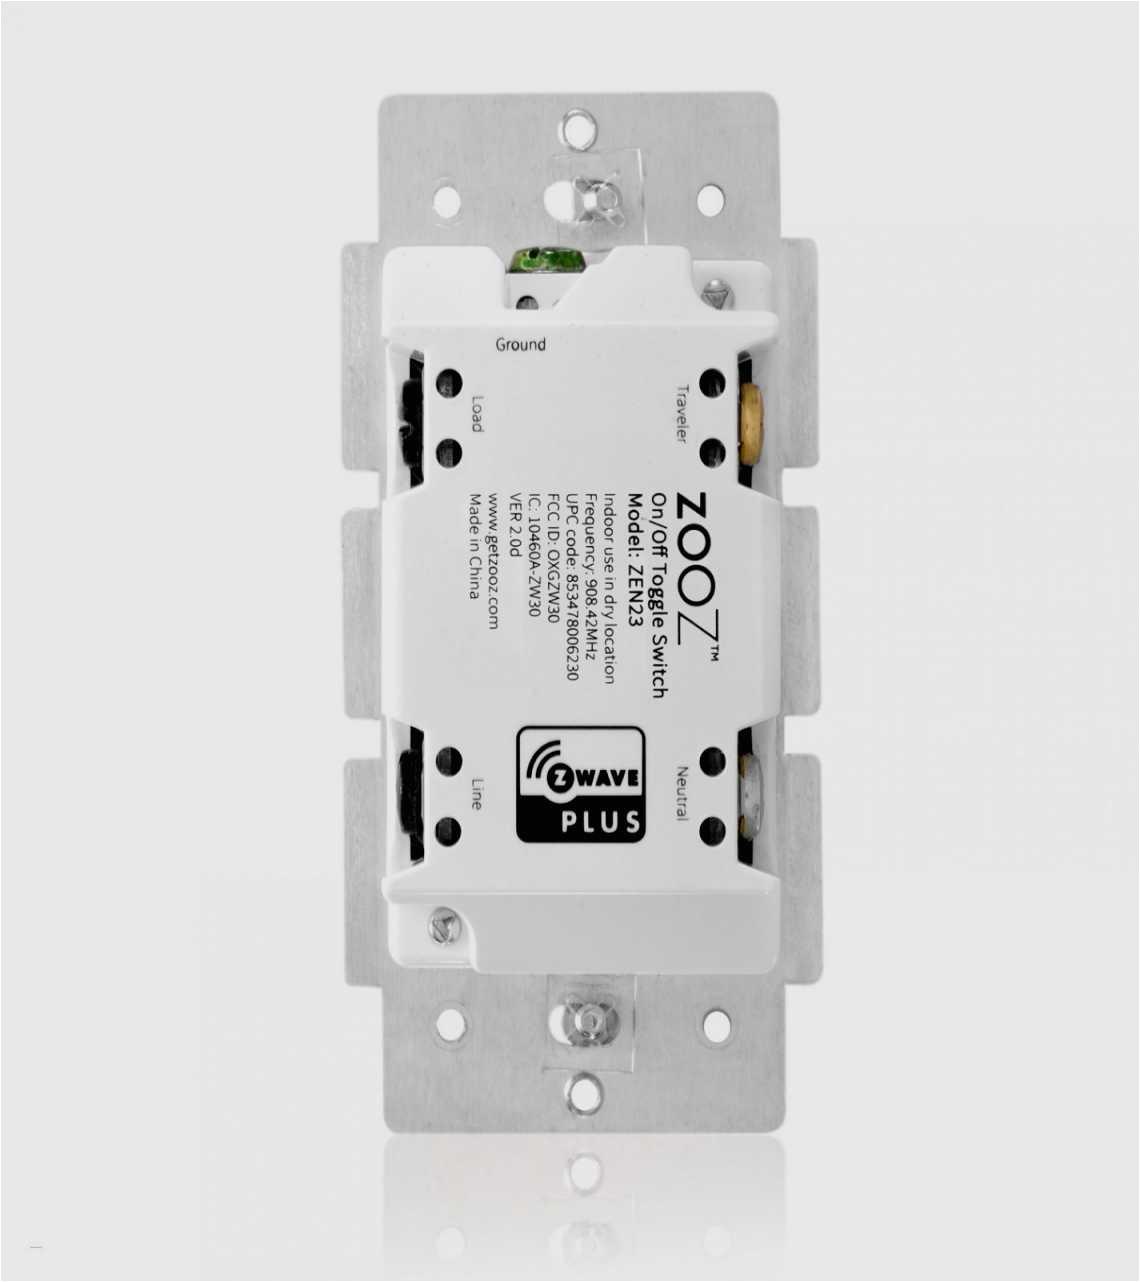 3 way toggle switch wiring diagram wiring diagram household light switch new 3 way switch wiring